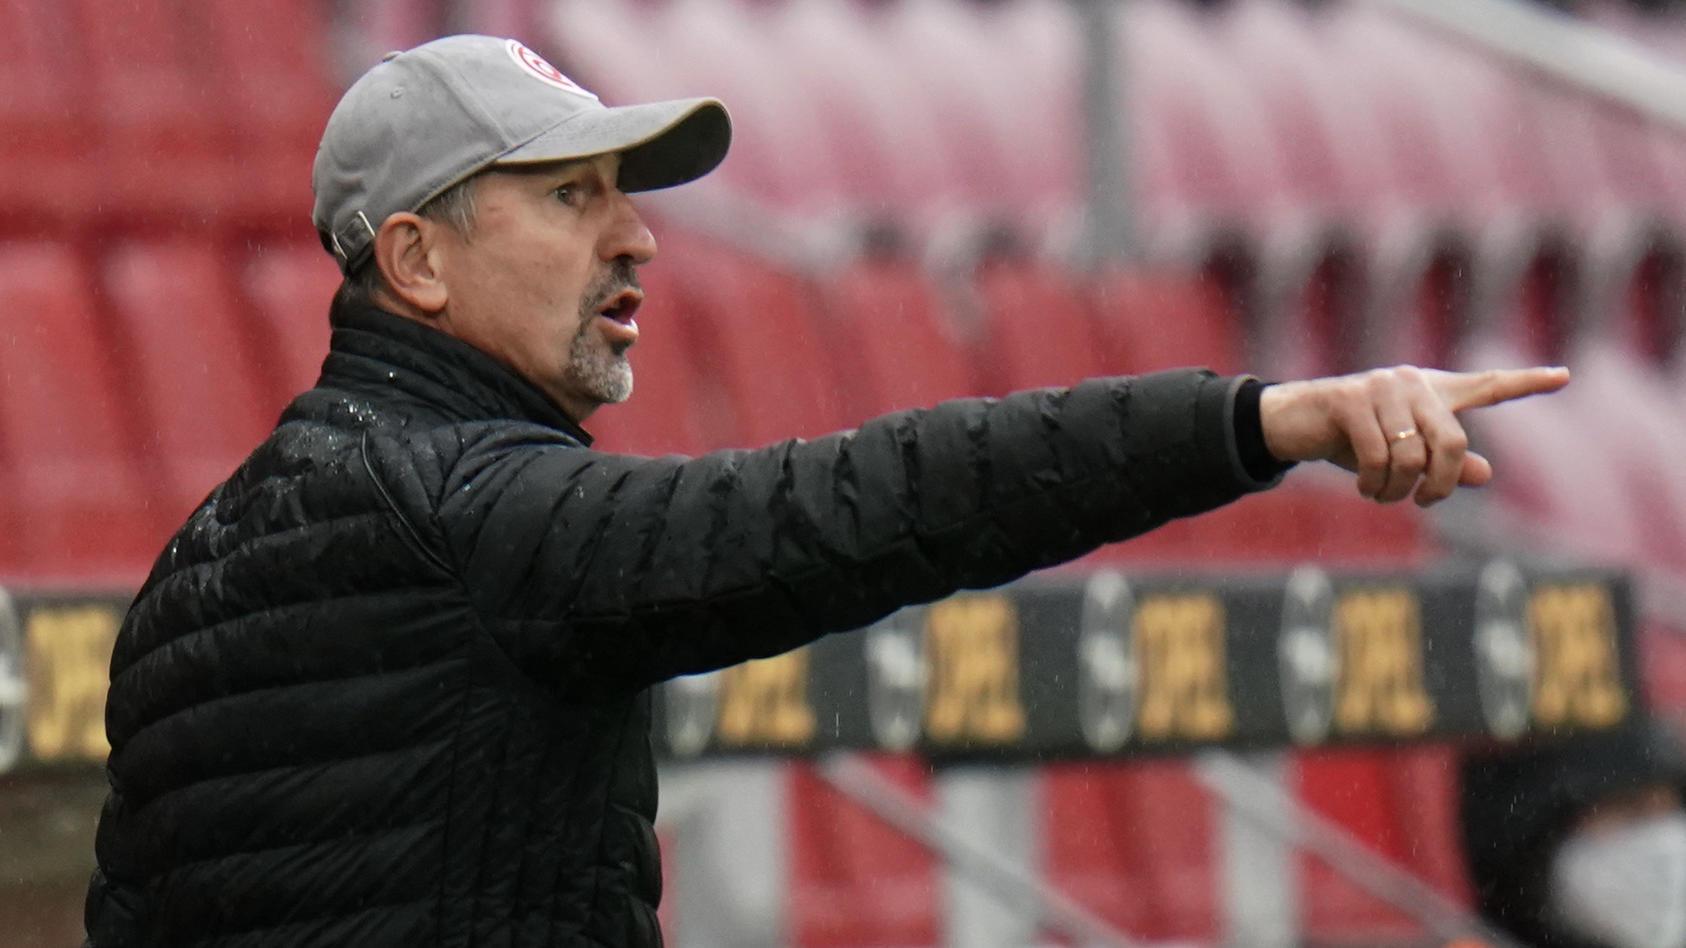 FSV Mainz 05 - Achim Beierlorzer